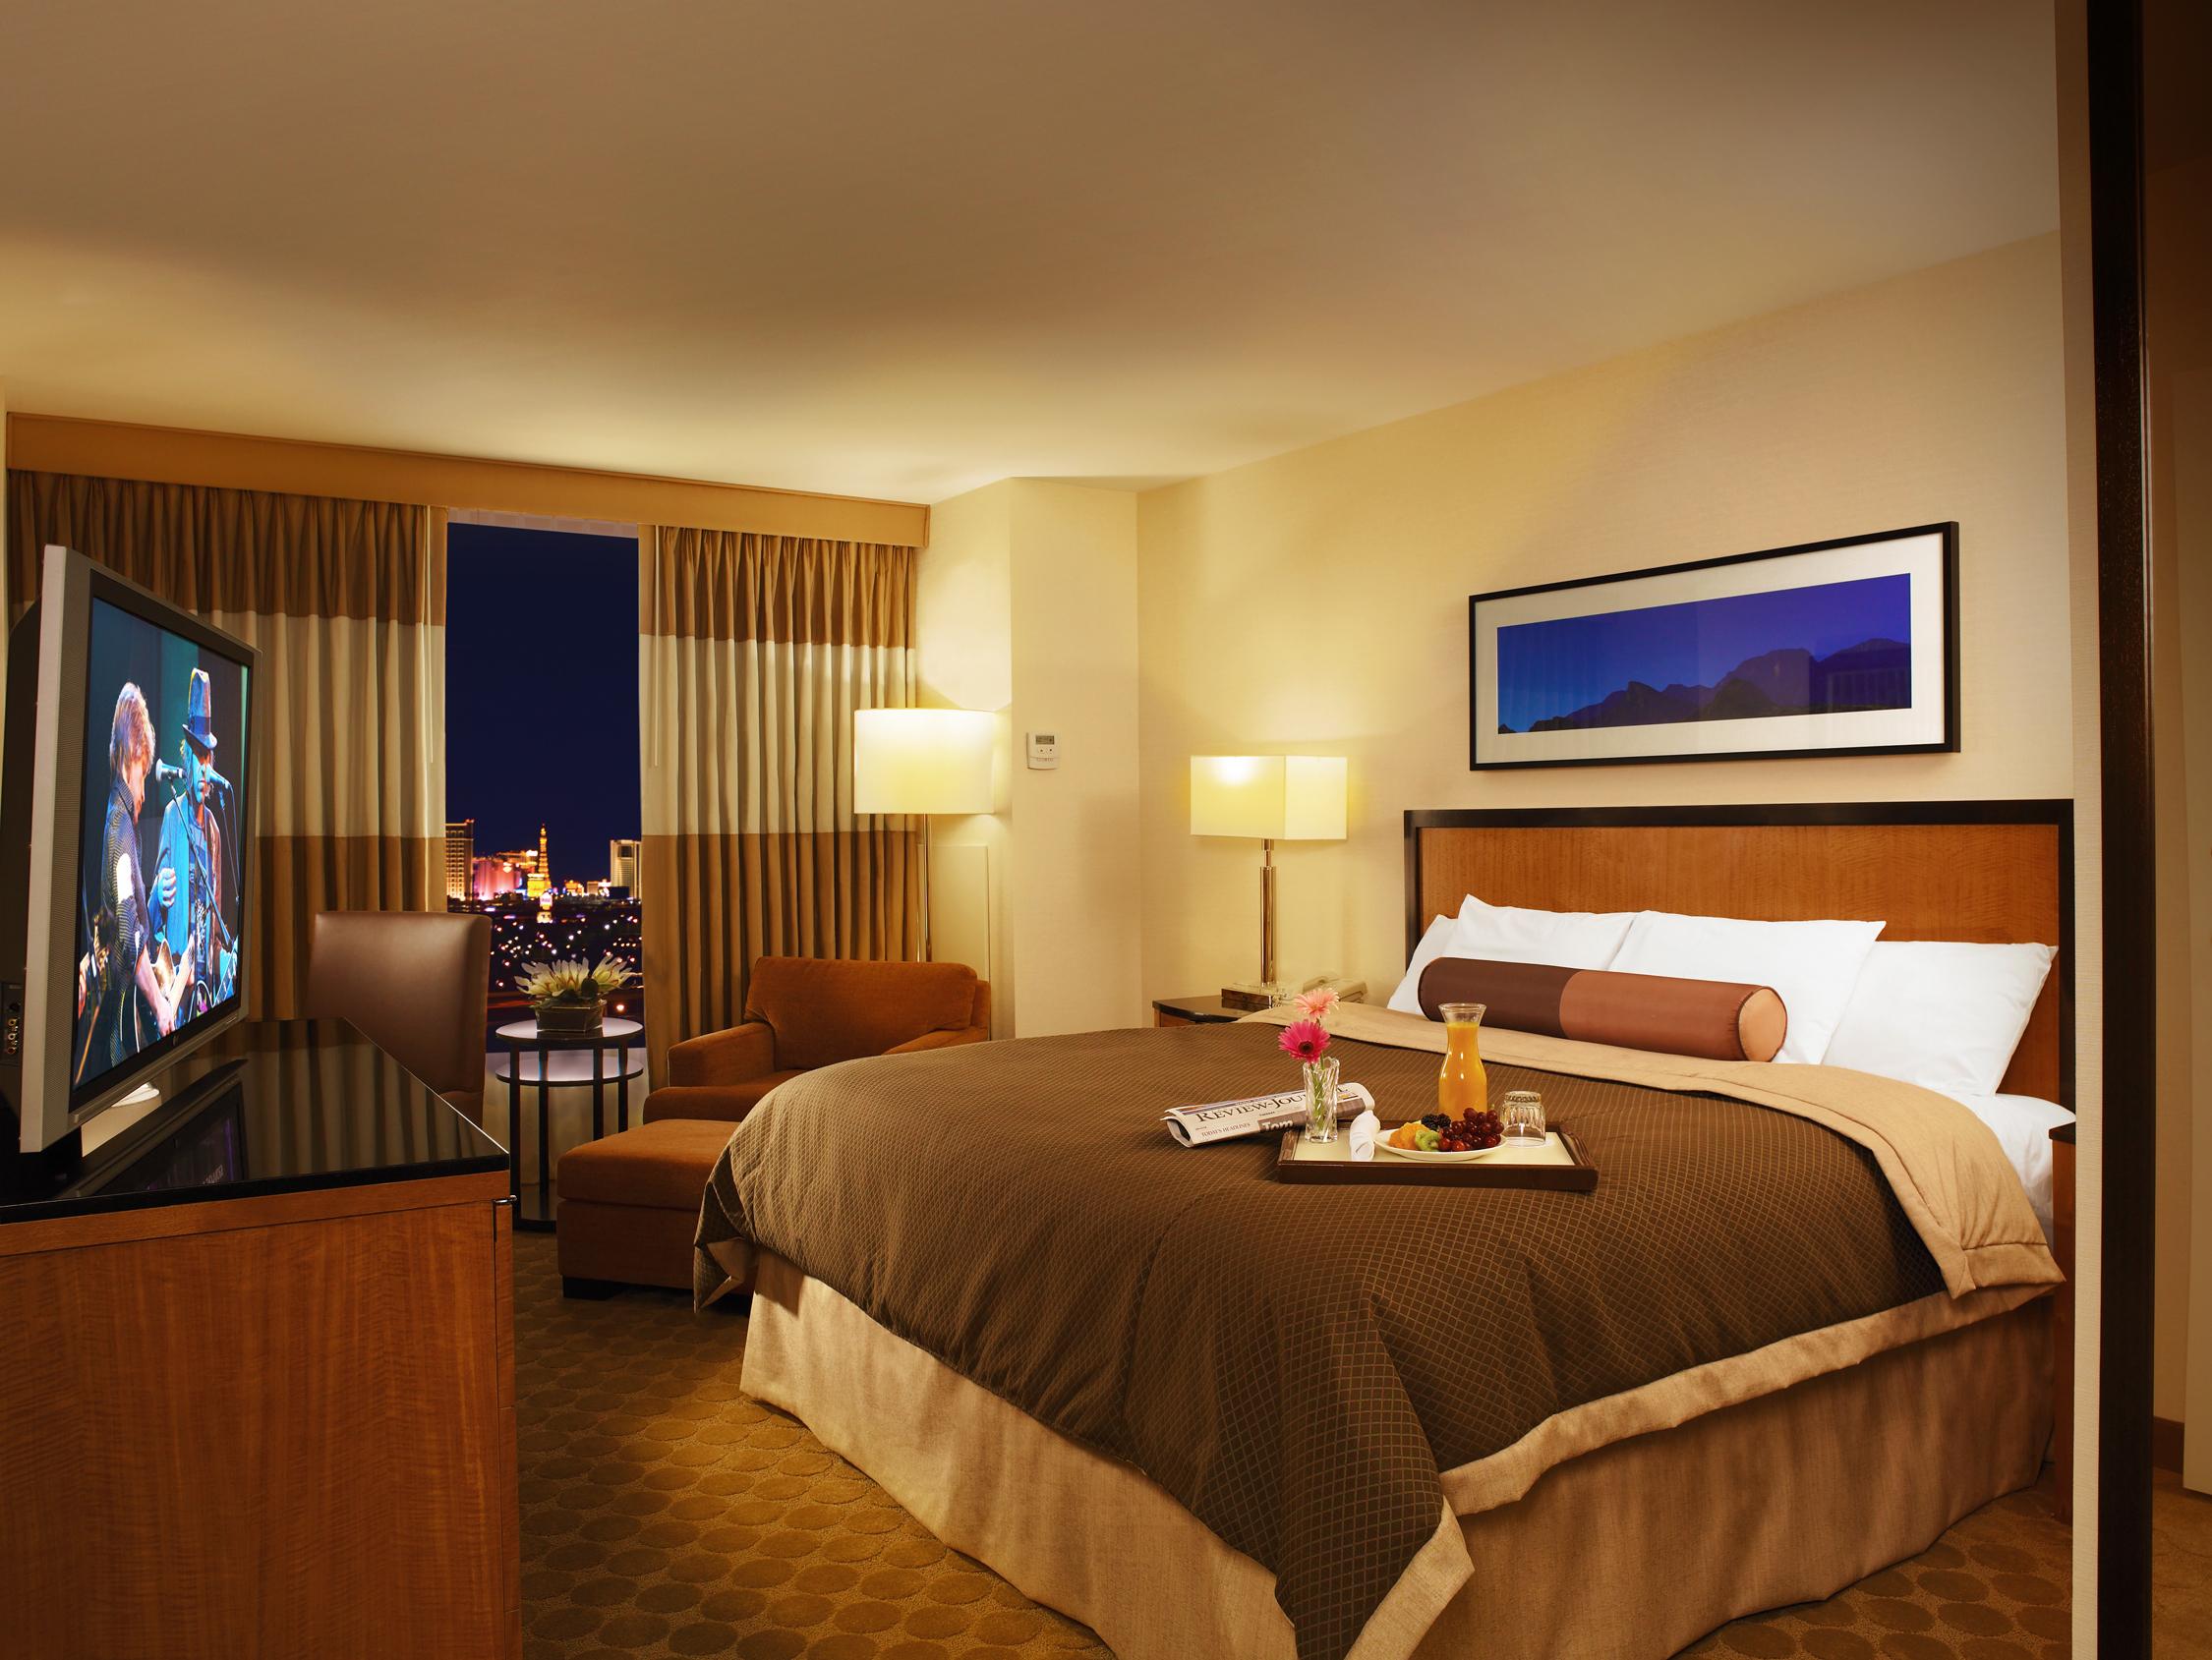 Palace station hotel casino vegas resorts hotel and casino in atlantic city